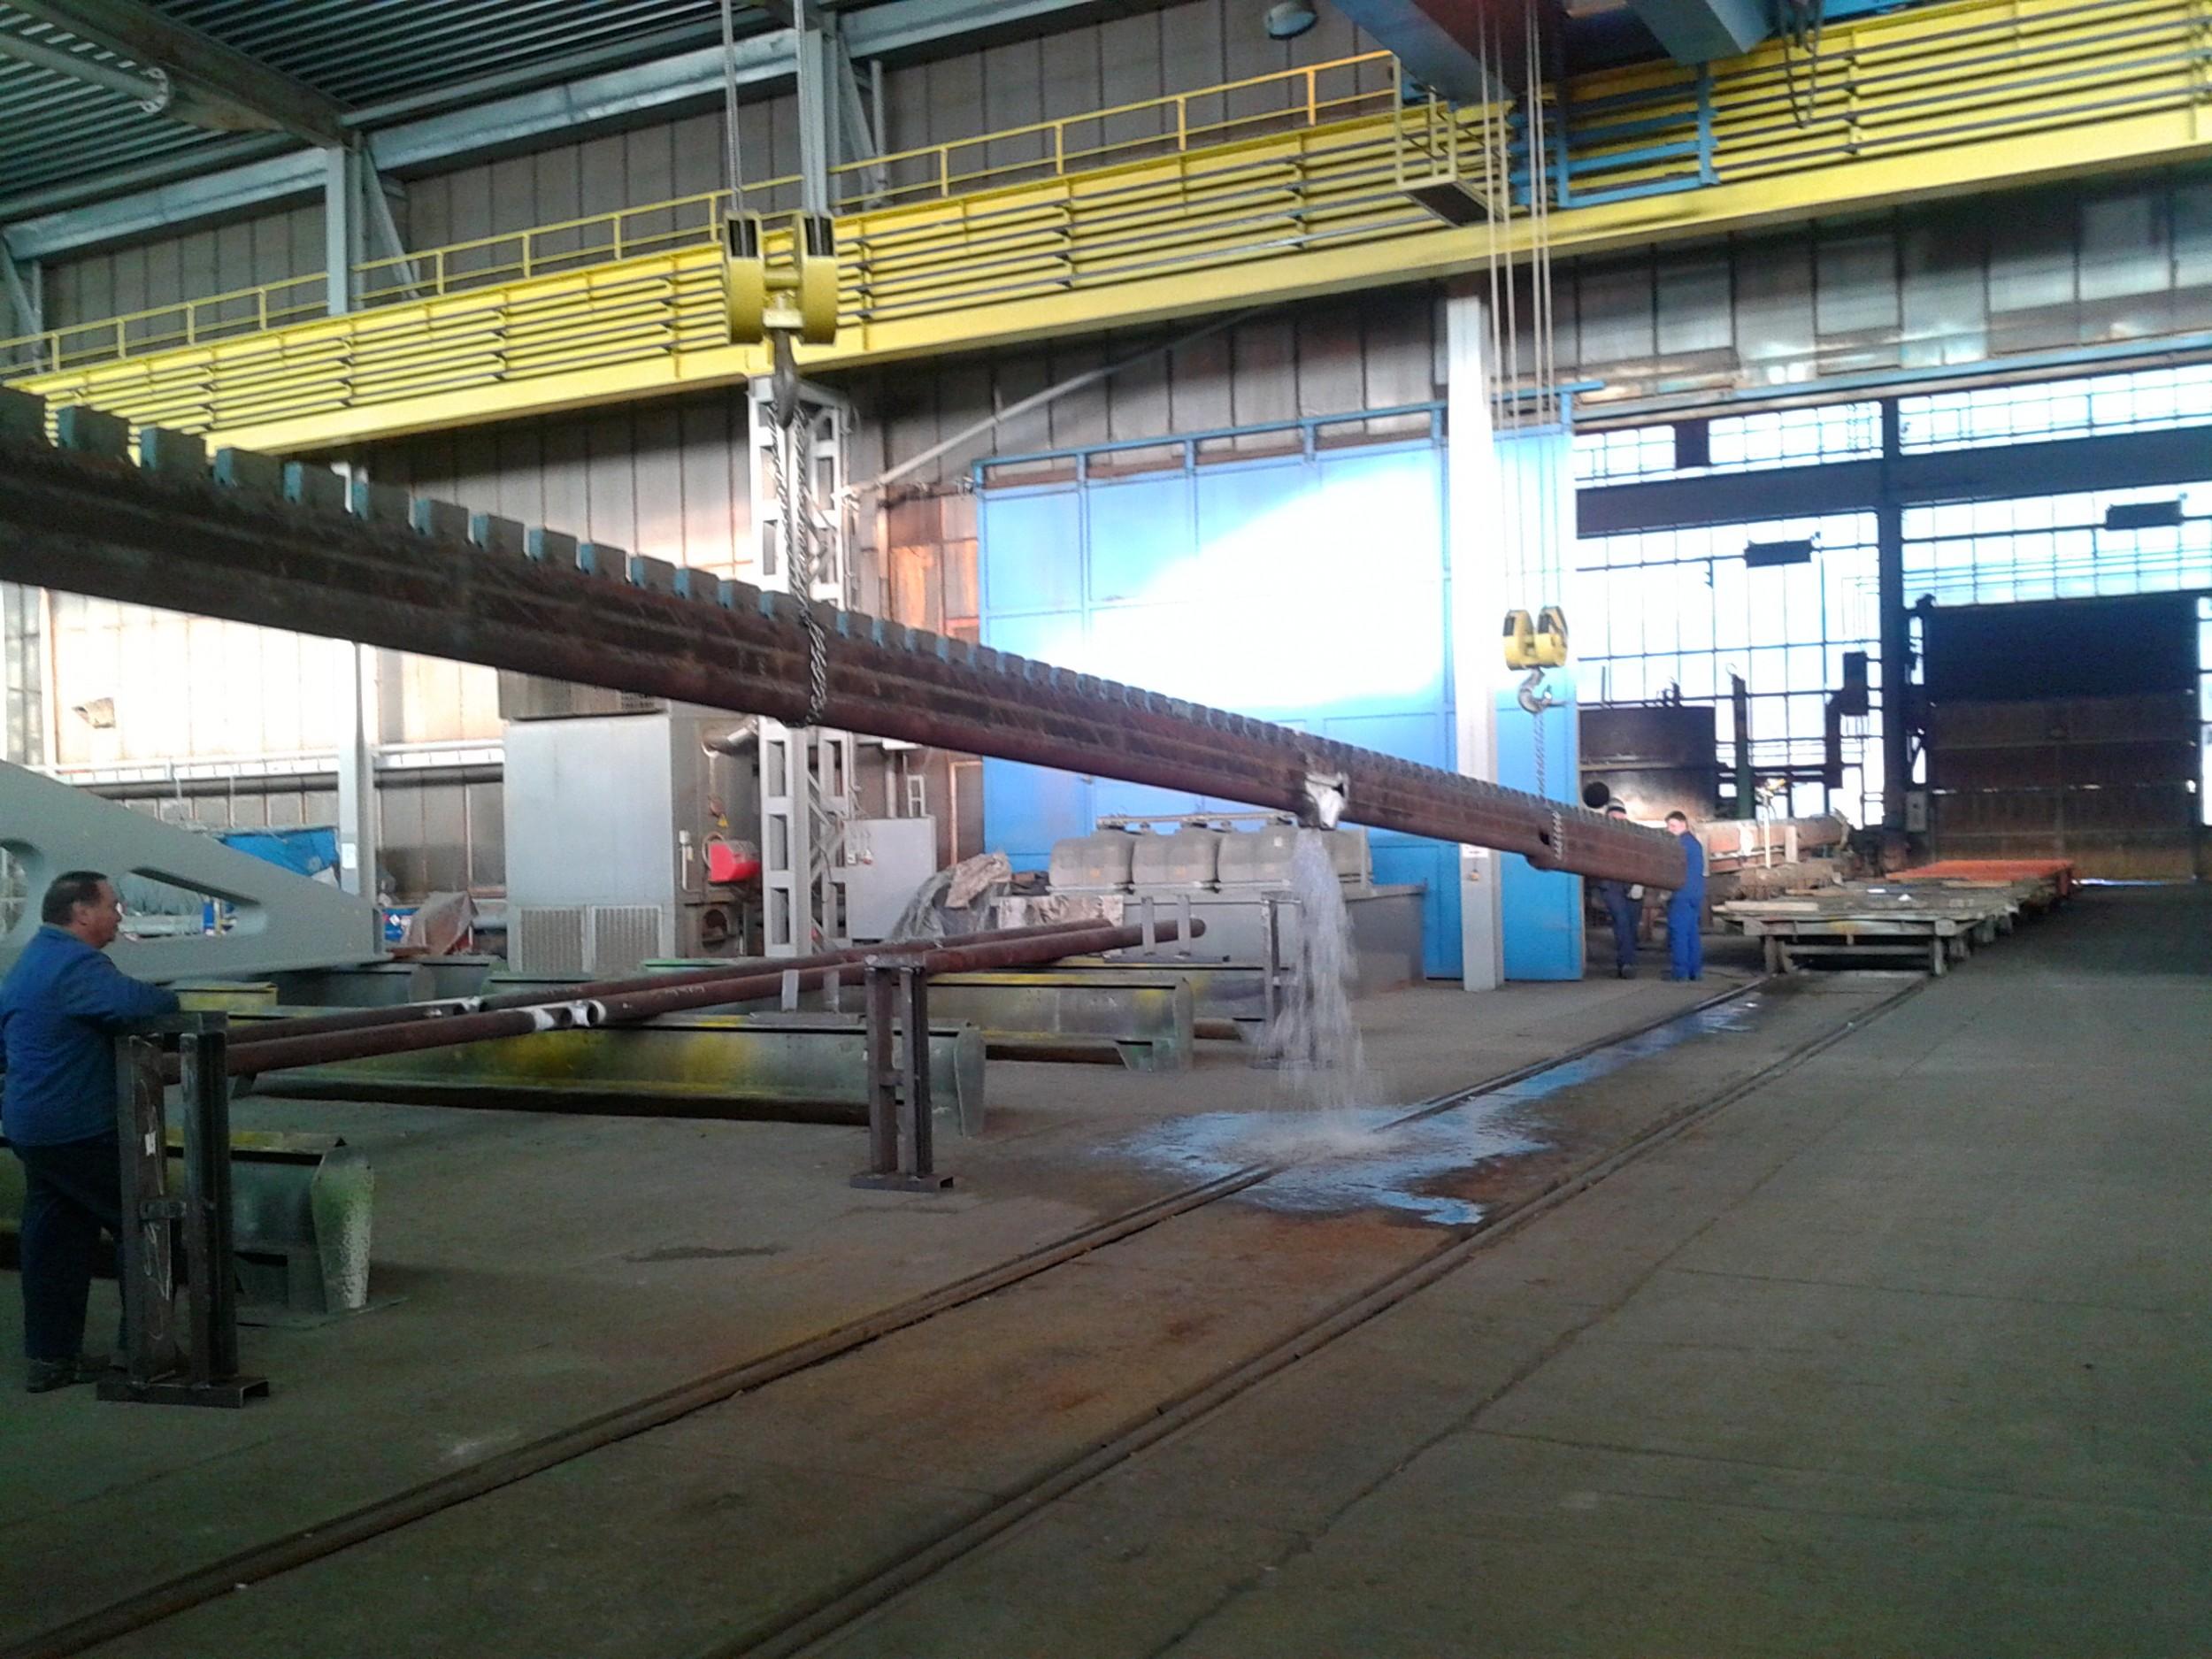 Hubbalken / Lifting beams